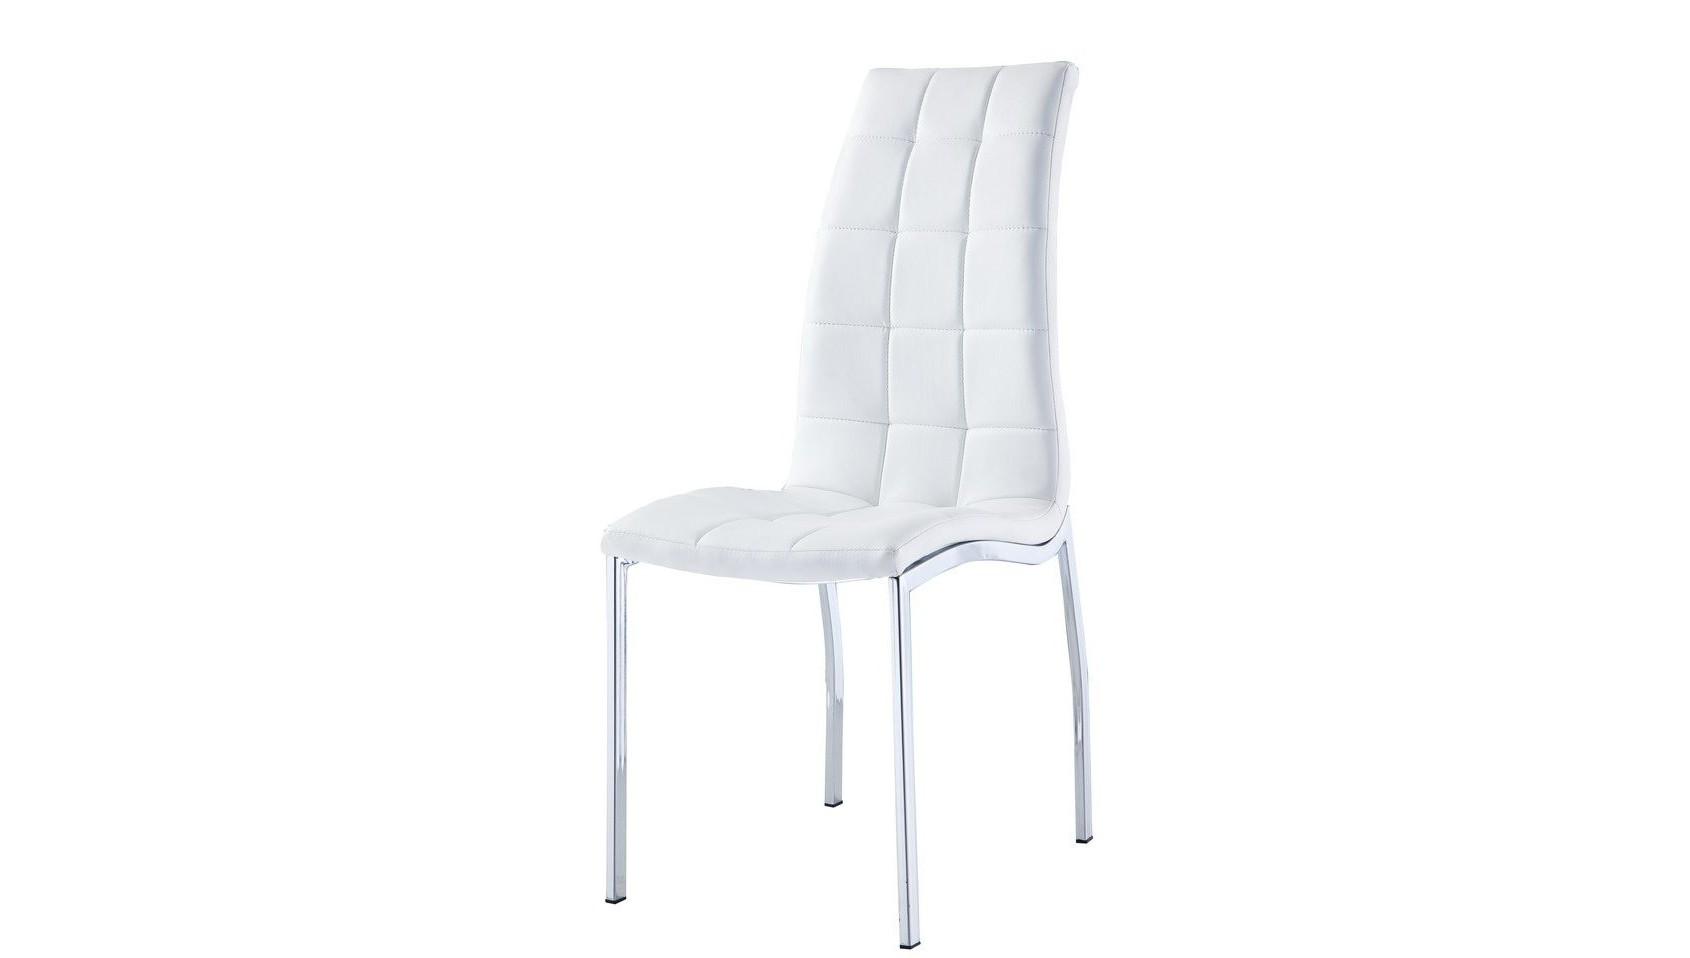 Стул DC365 белыйОбеденные стулья<br><br><br>Material: Кожа<br>Width см: 43<br>Depth см: 58<br>Height см: 105